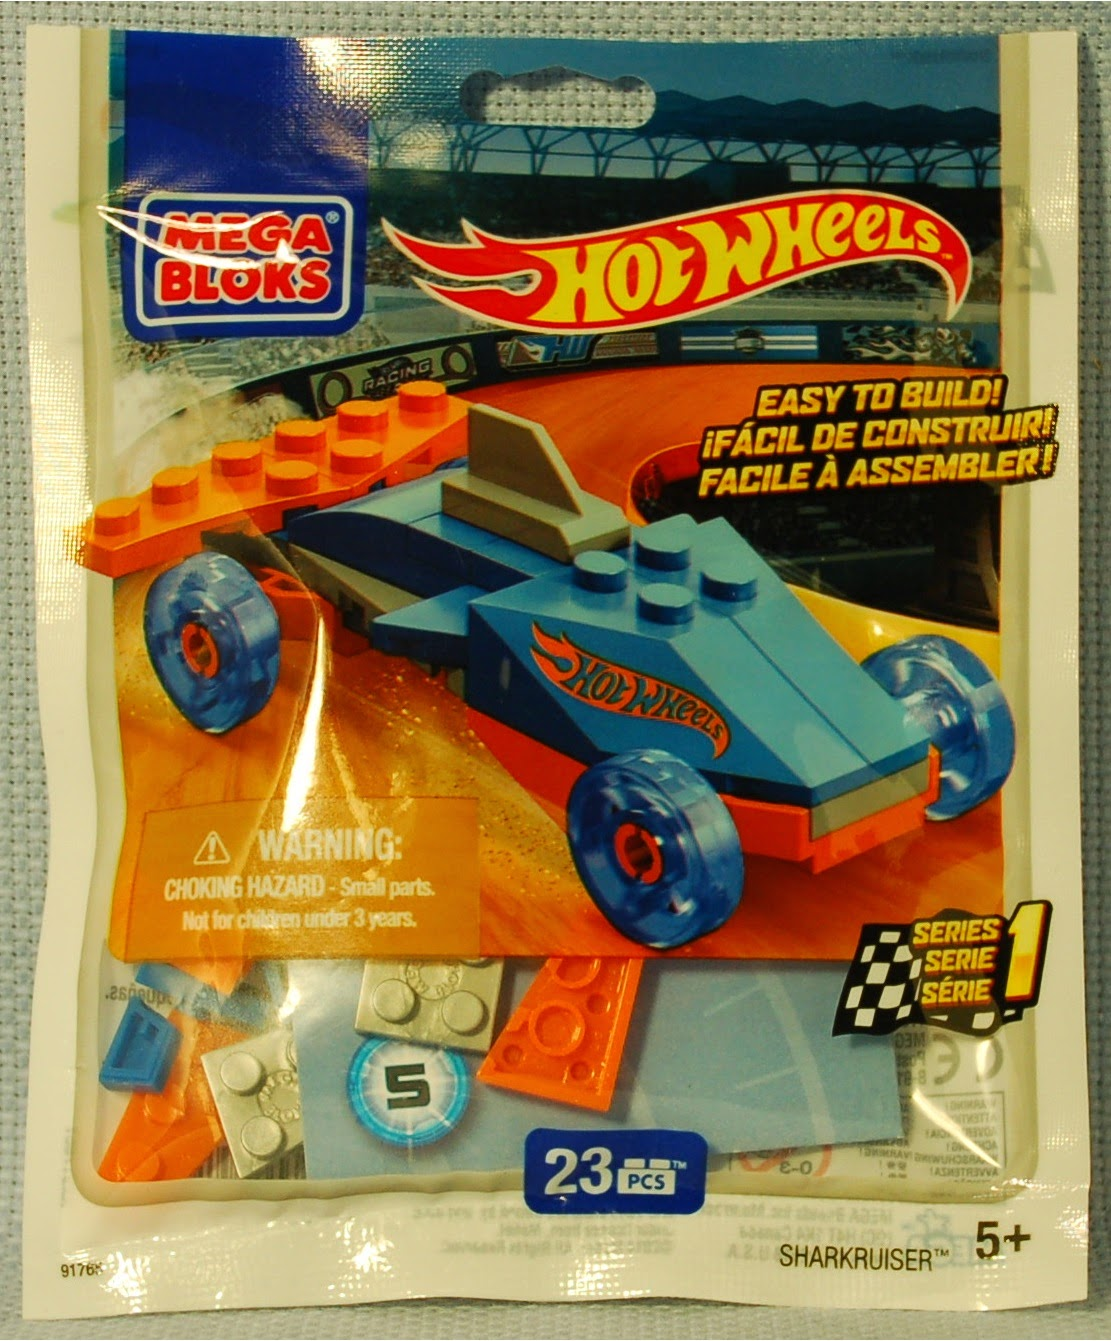 The Mobile Frame Garage: Purity: 91765 Mega Bloks Hot